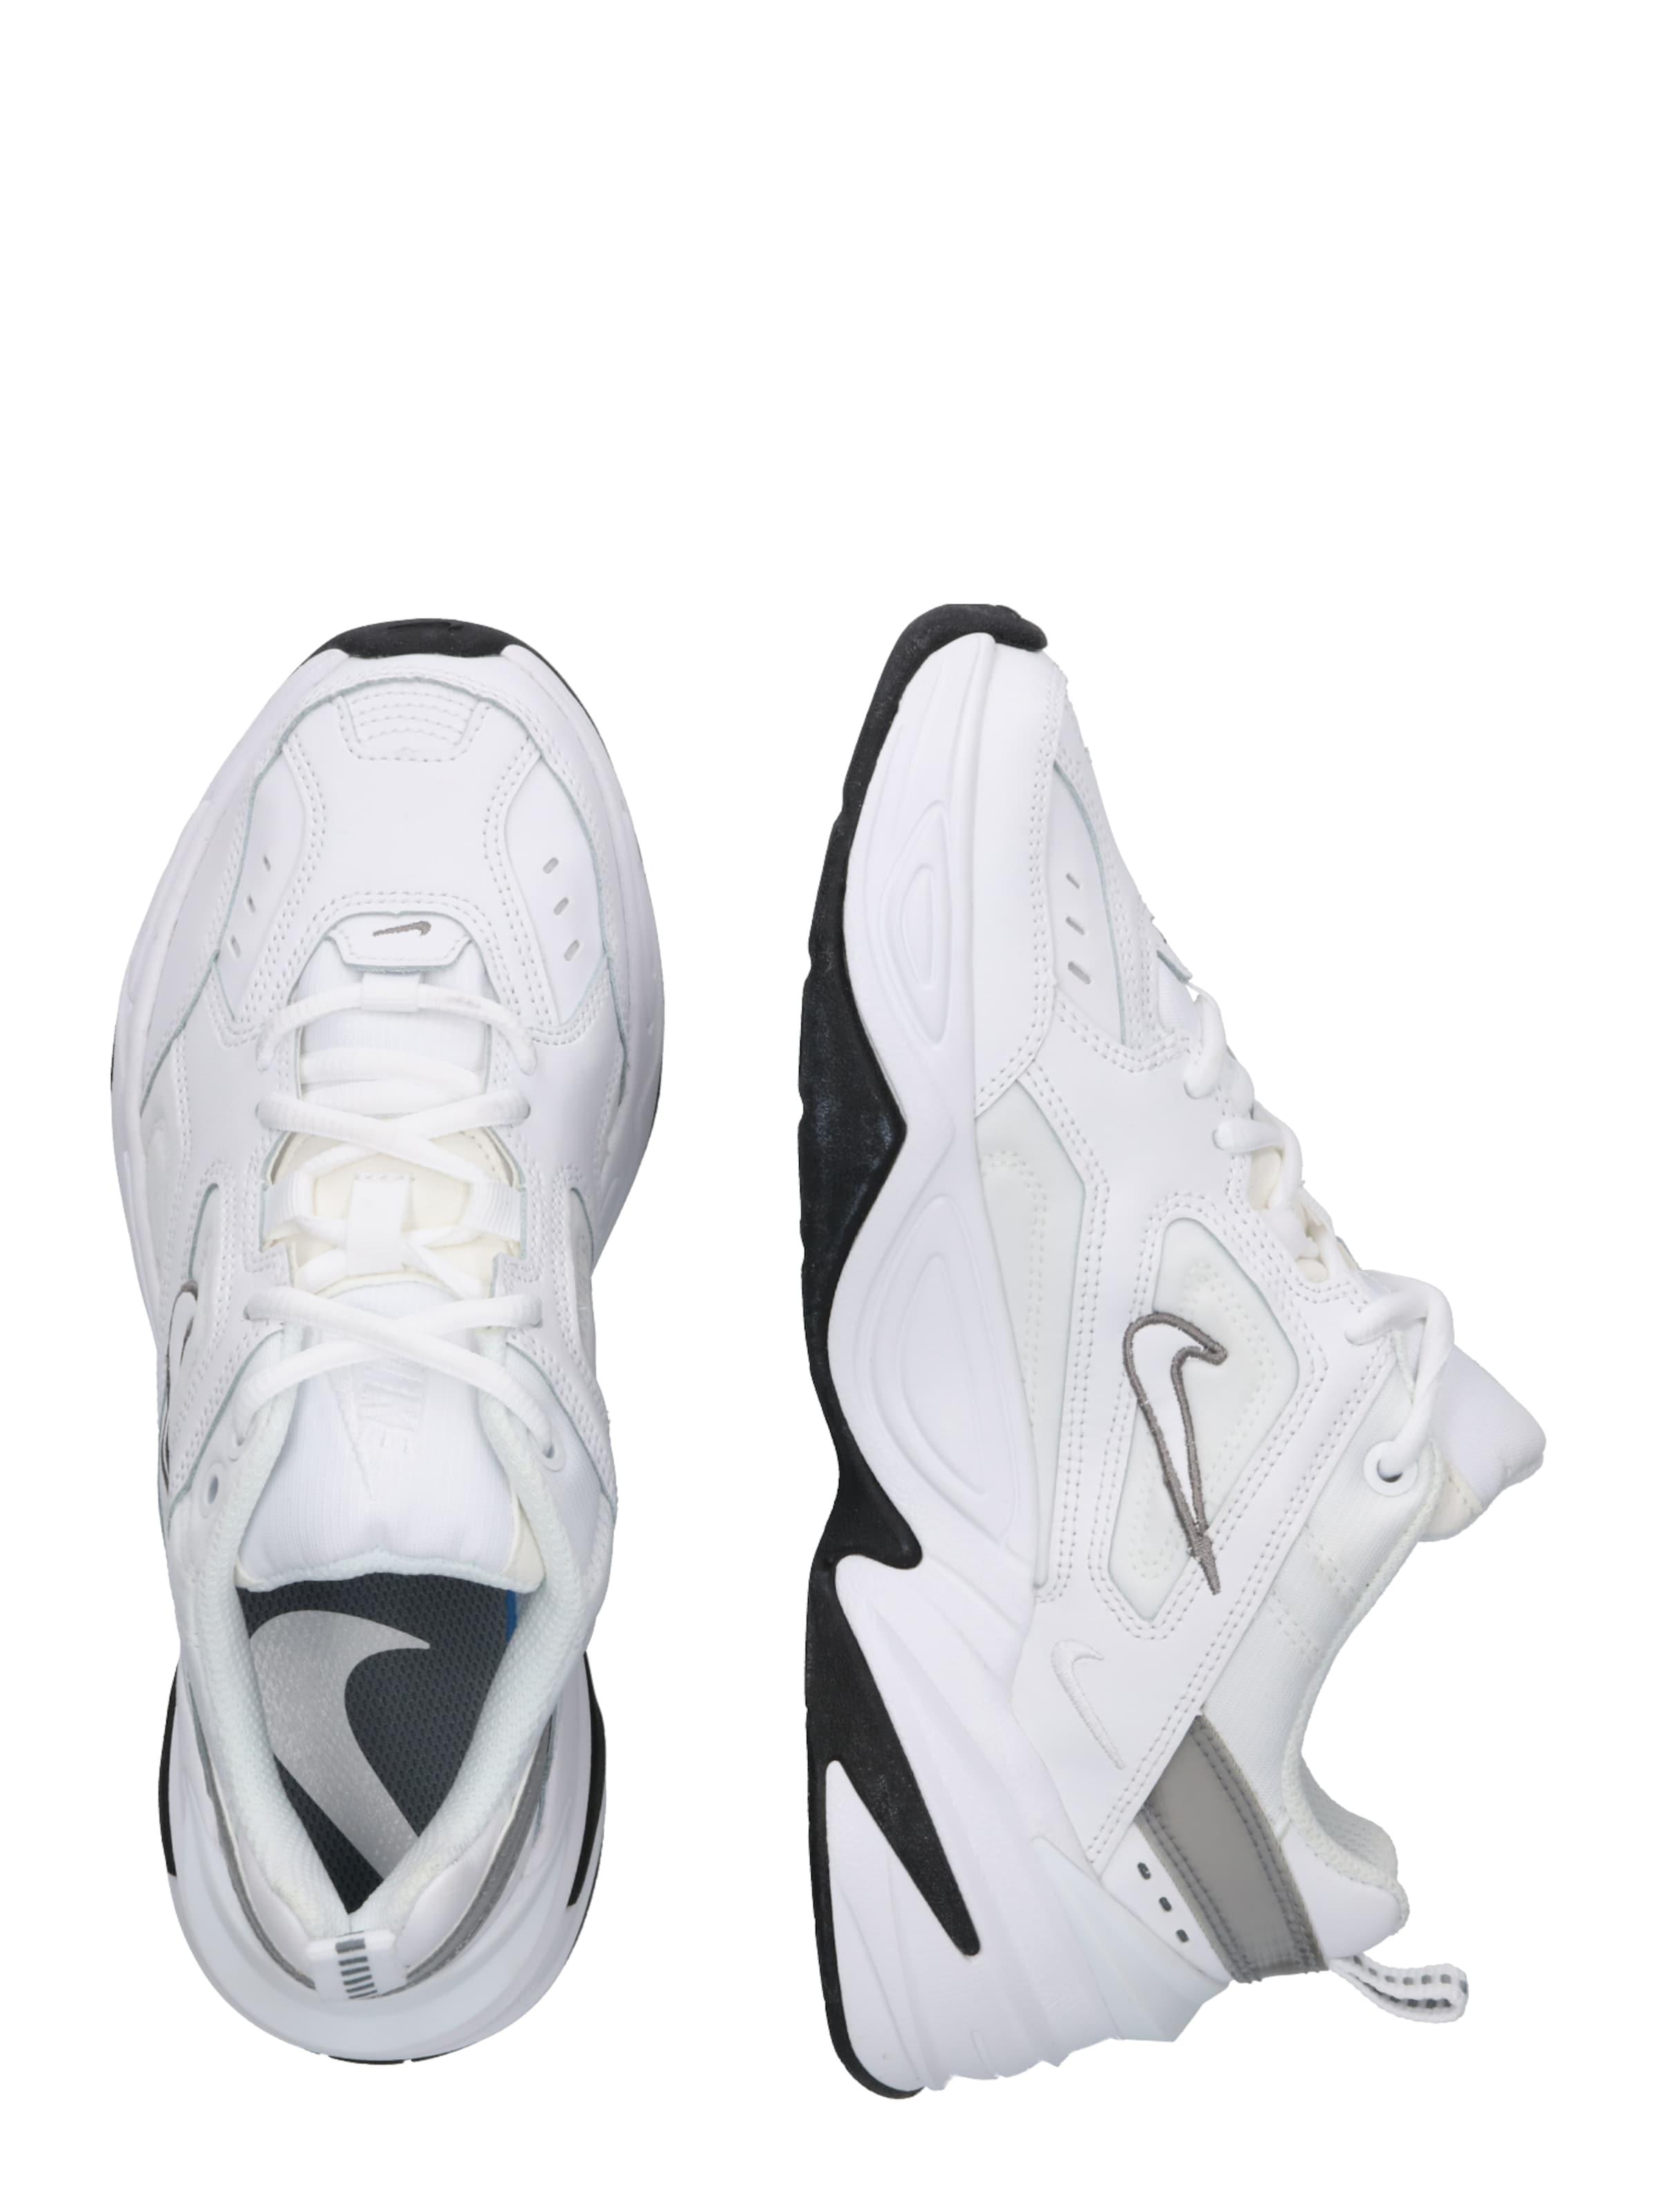 Tekno' En Basses M2k ClairBlanc Nike Sportswear Baskets Gris 'w N0v8nwmO